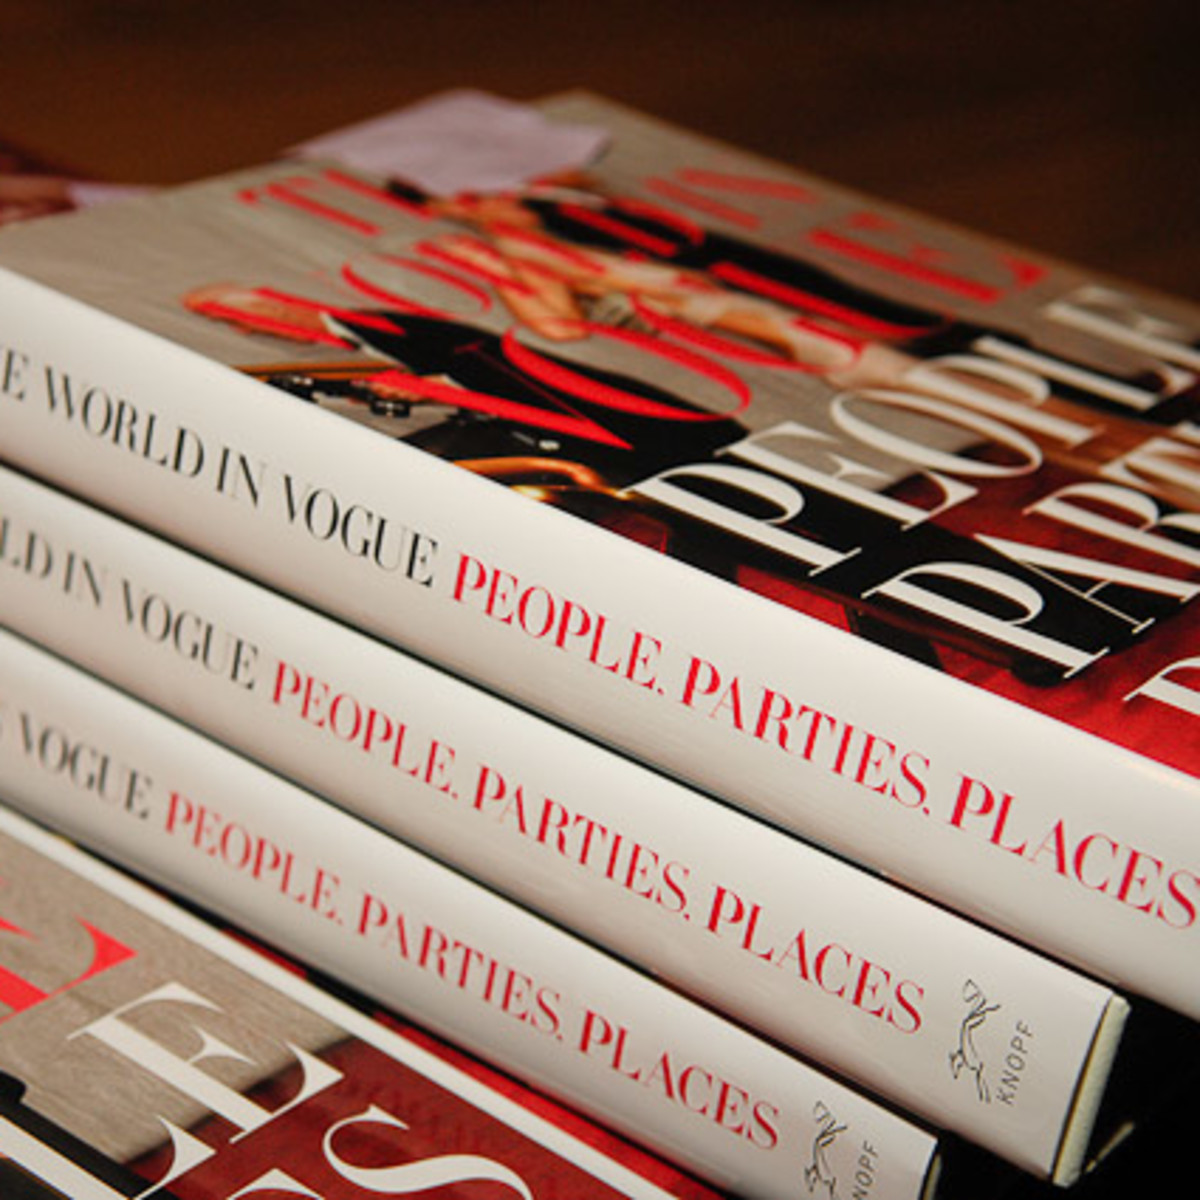 News_Vogue at Becca_Feb. 2010_books